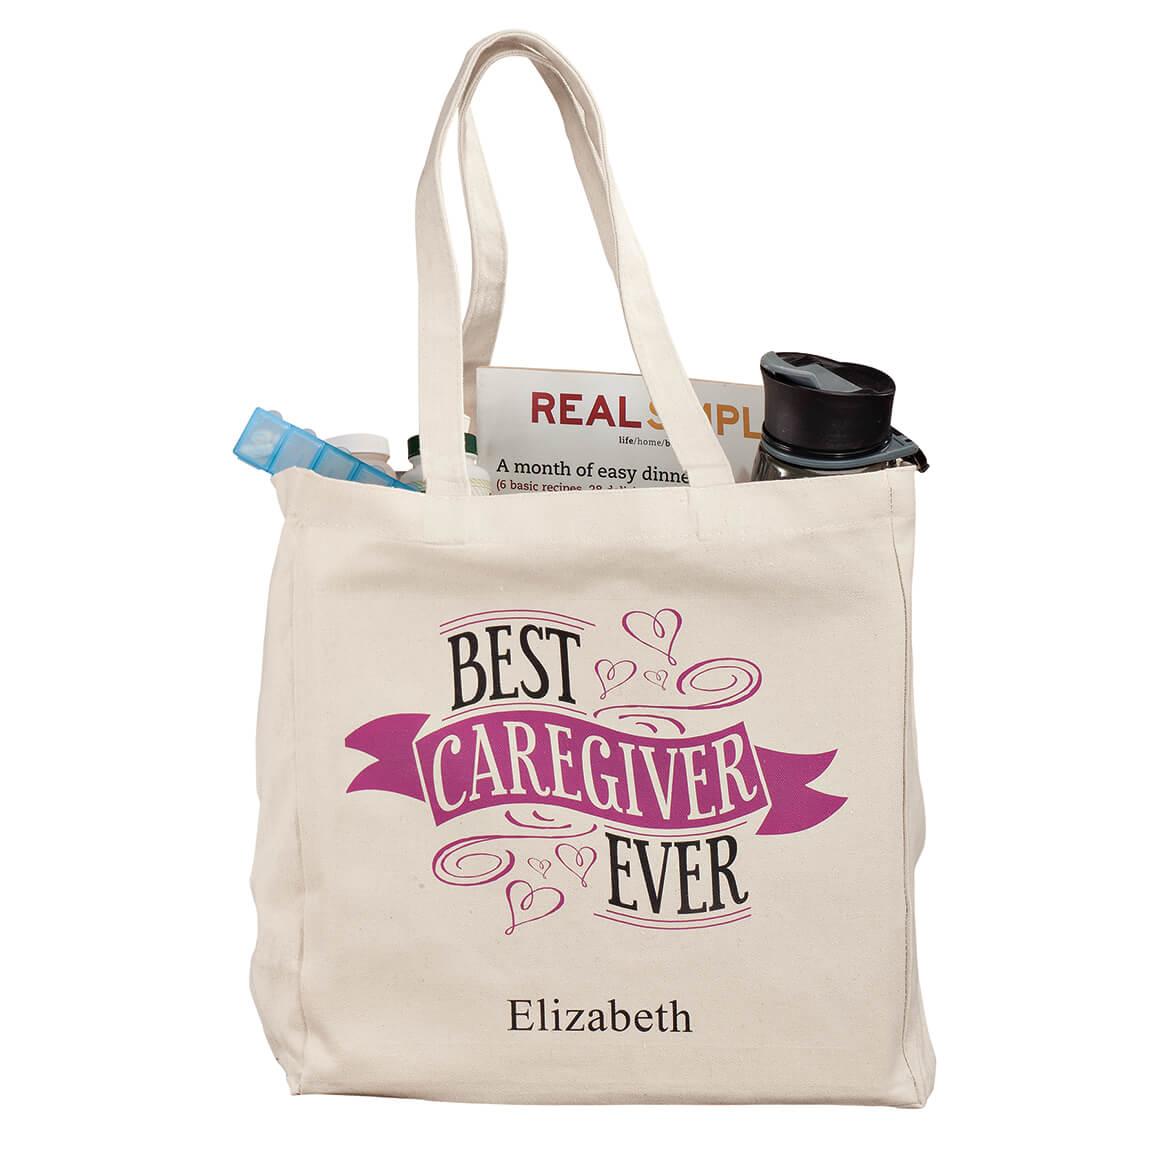 Personalized Caregiver Tote-364382